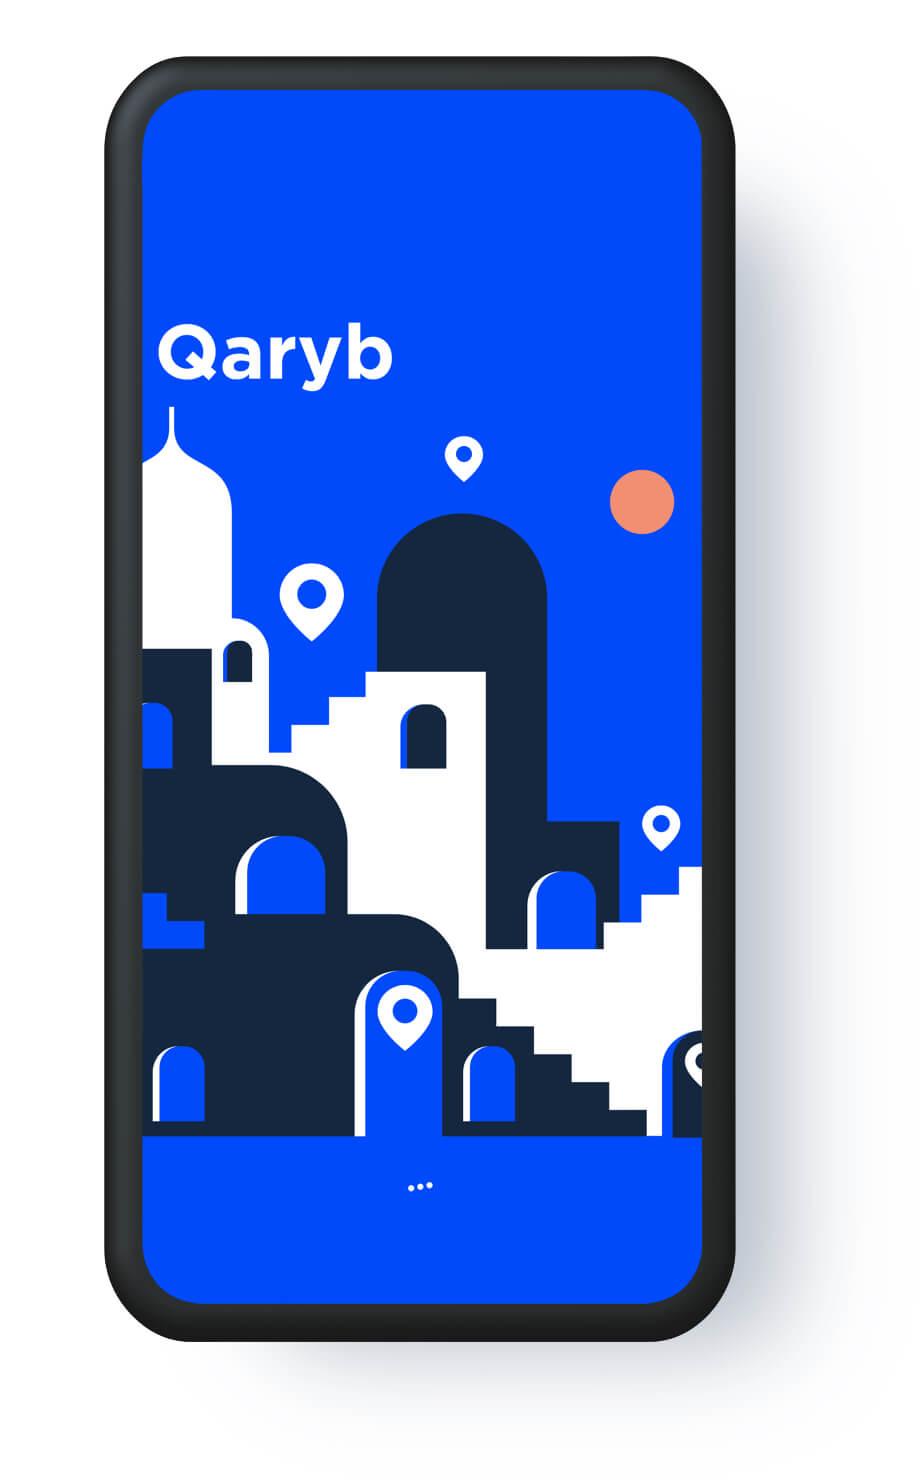 Qaryb — Mobile app